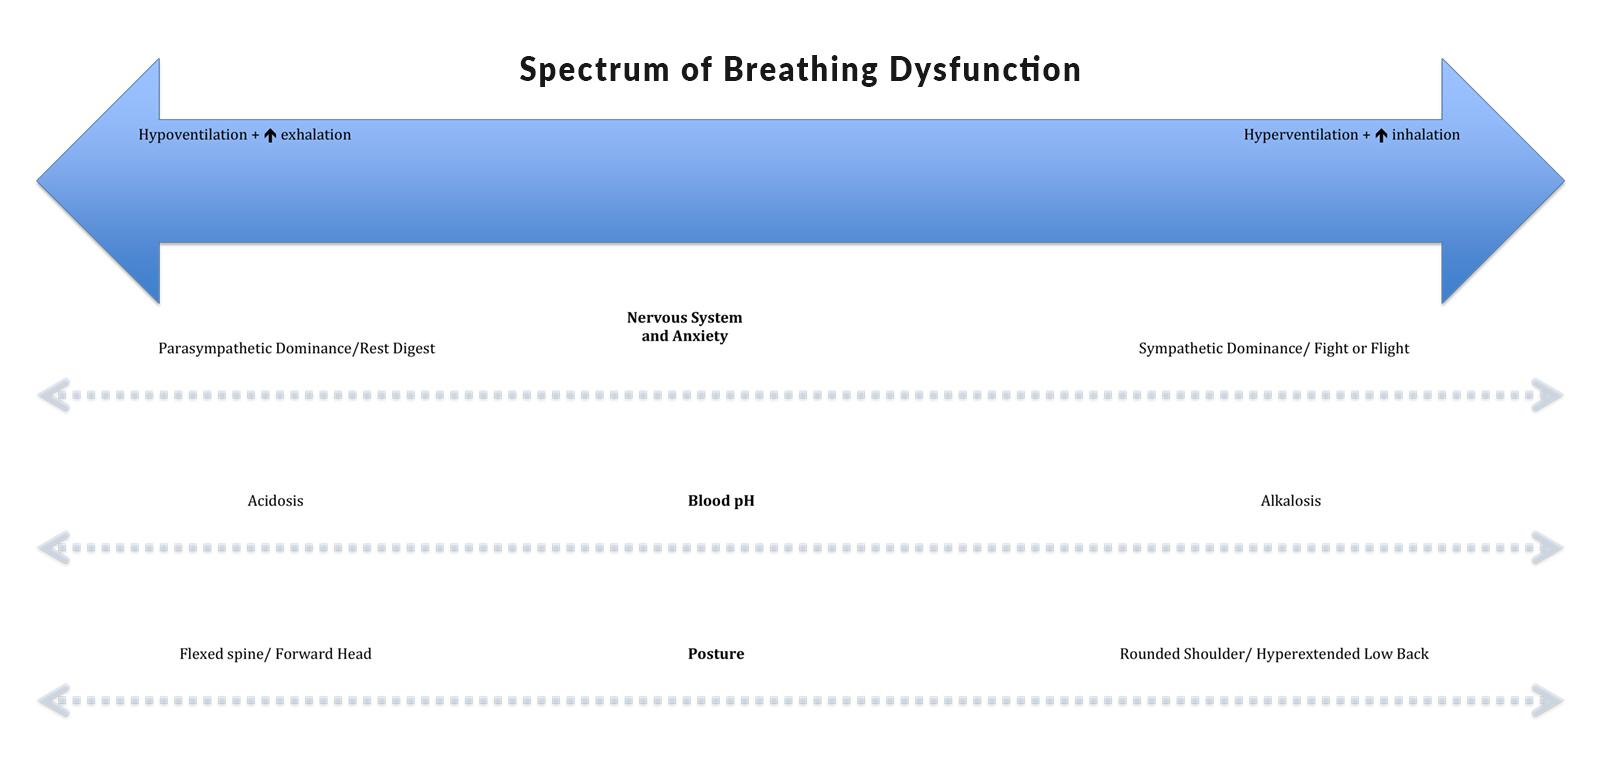 SpectrumBreathingDysfunction_Diagram